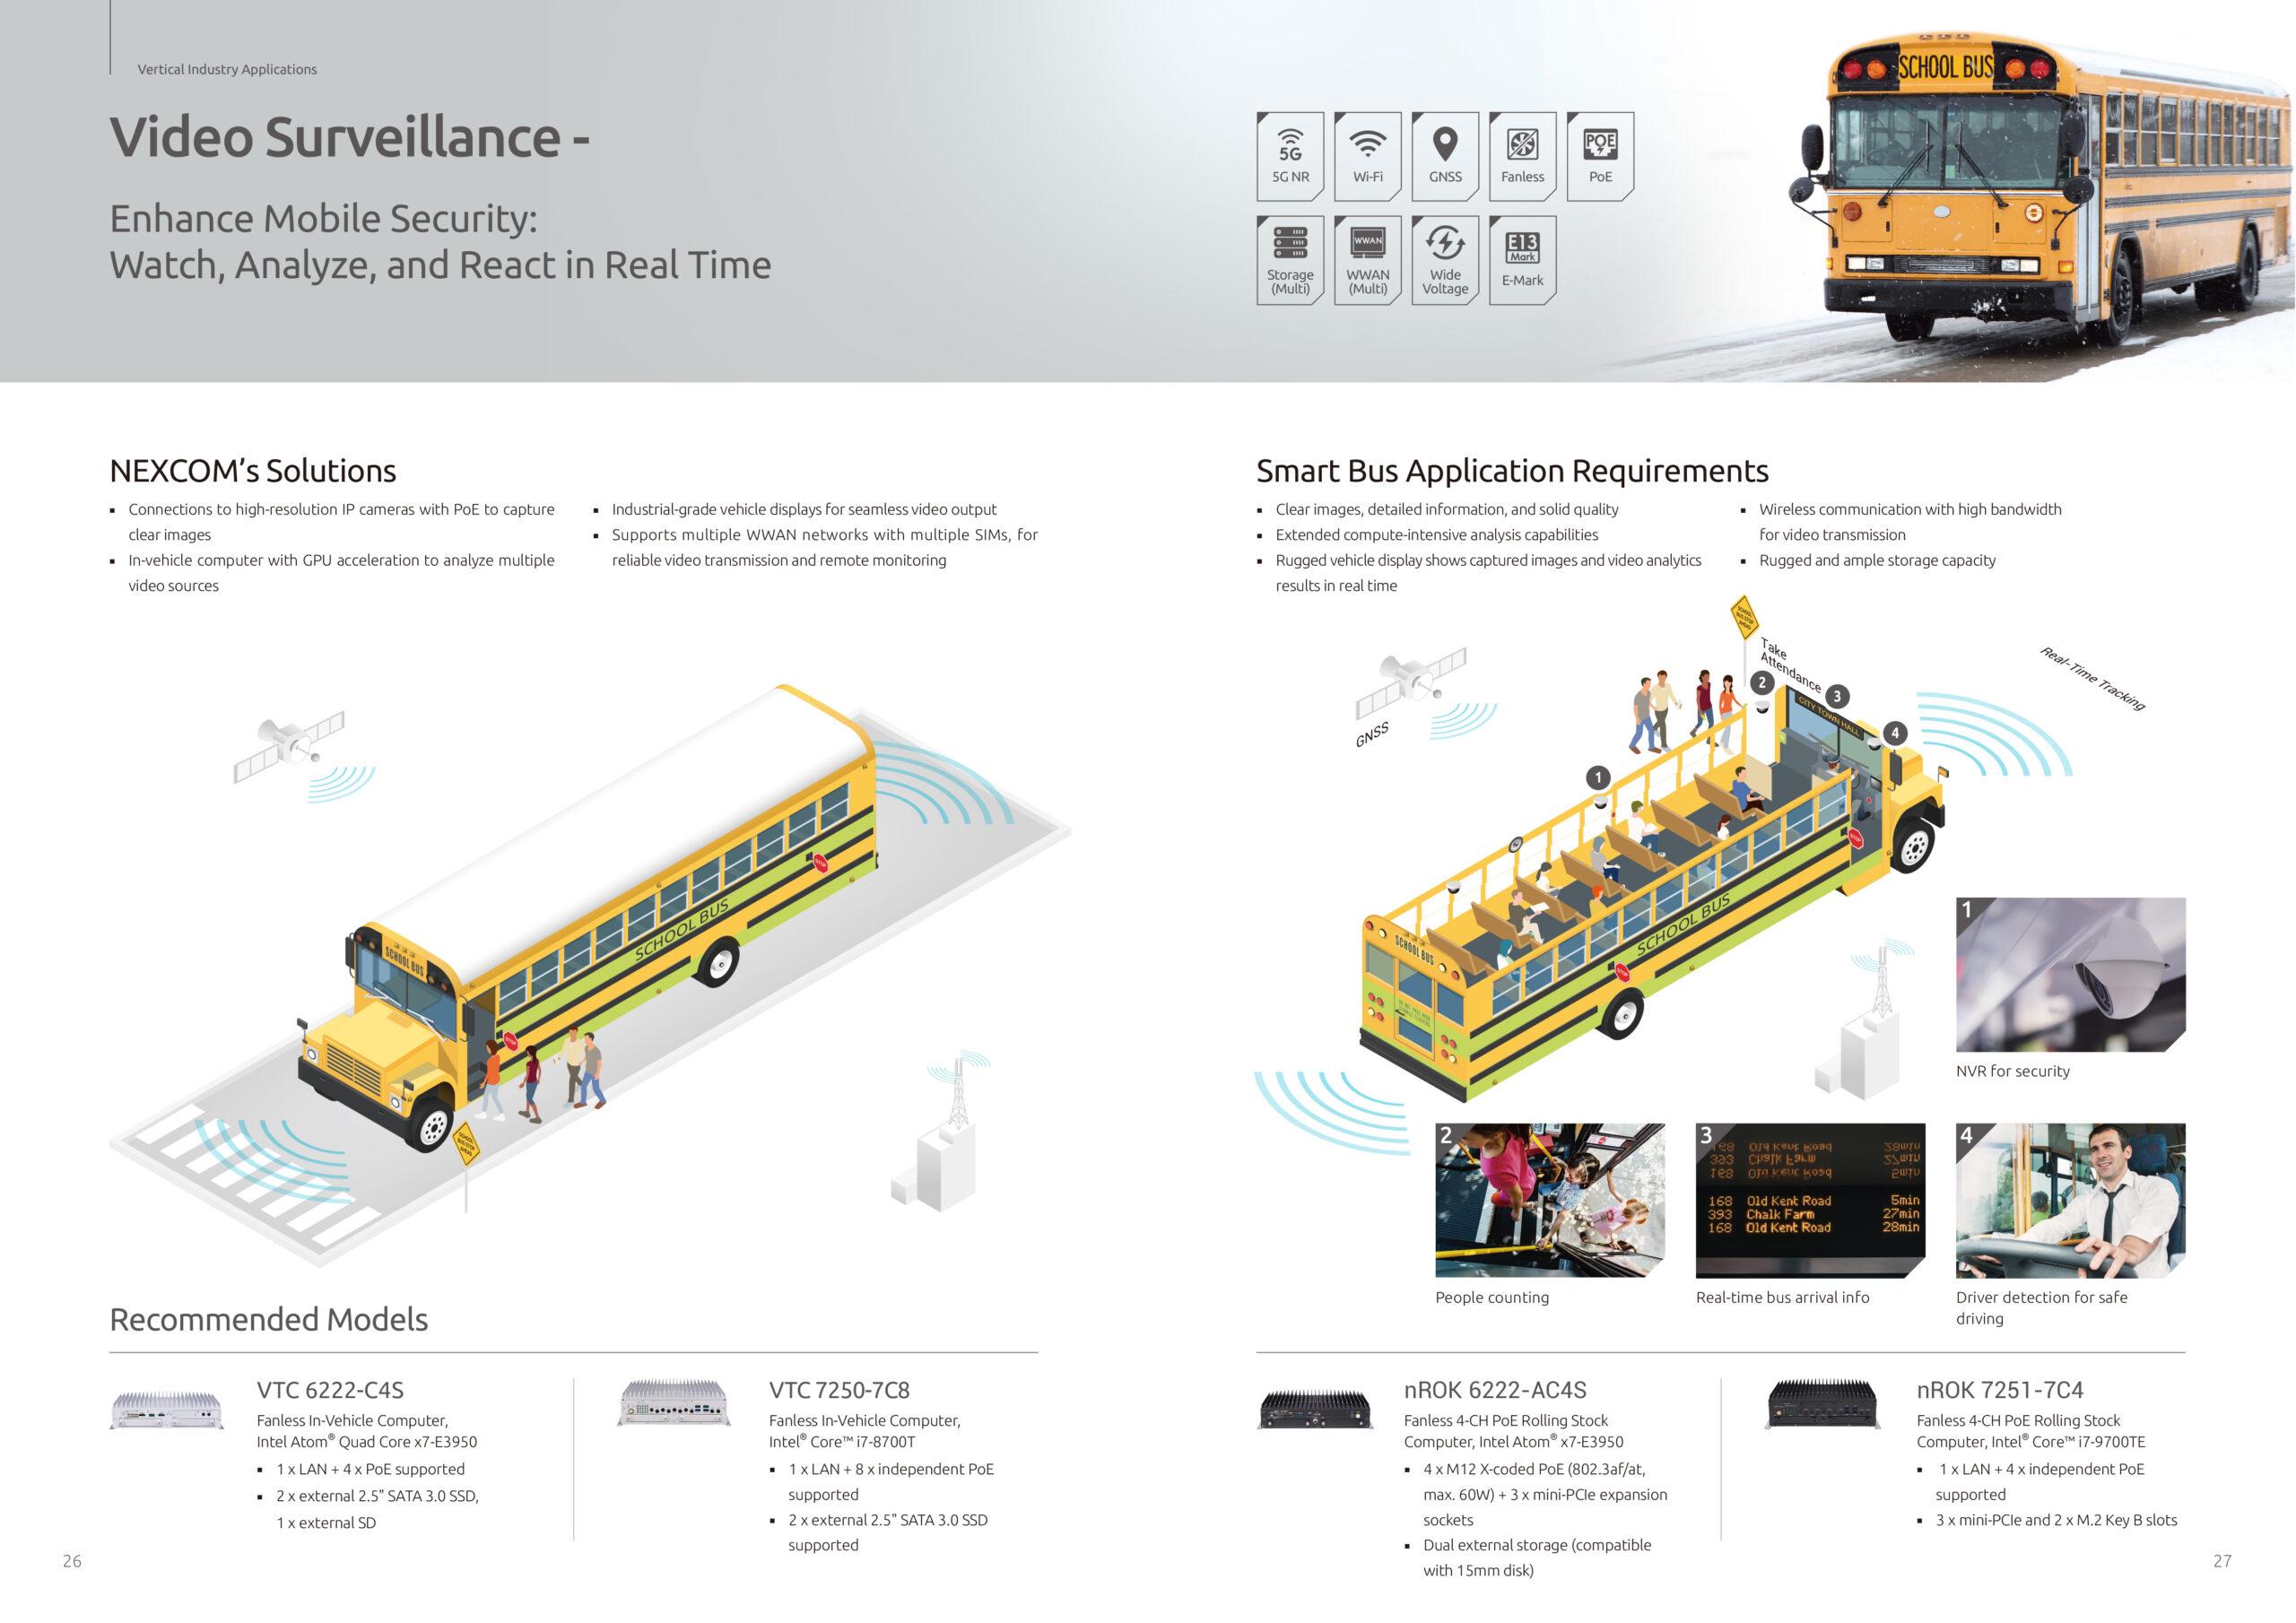 Video Surveillance Solution